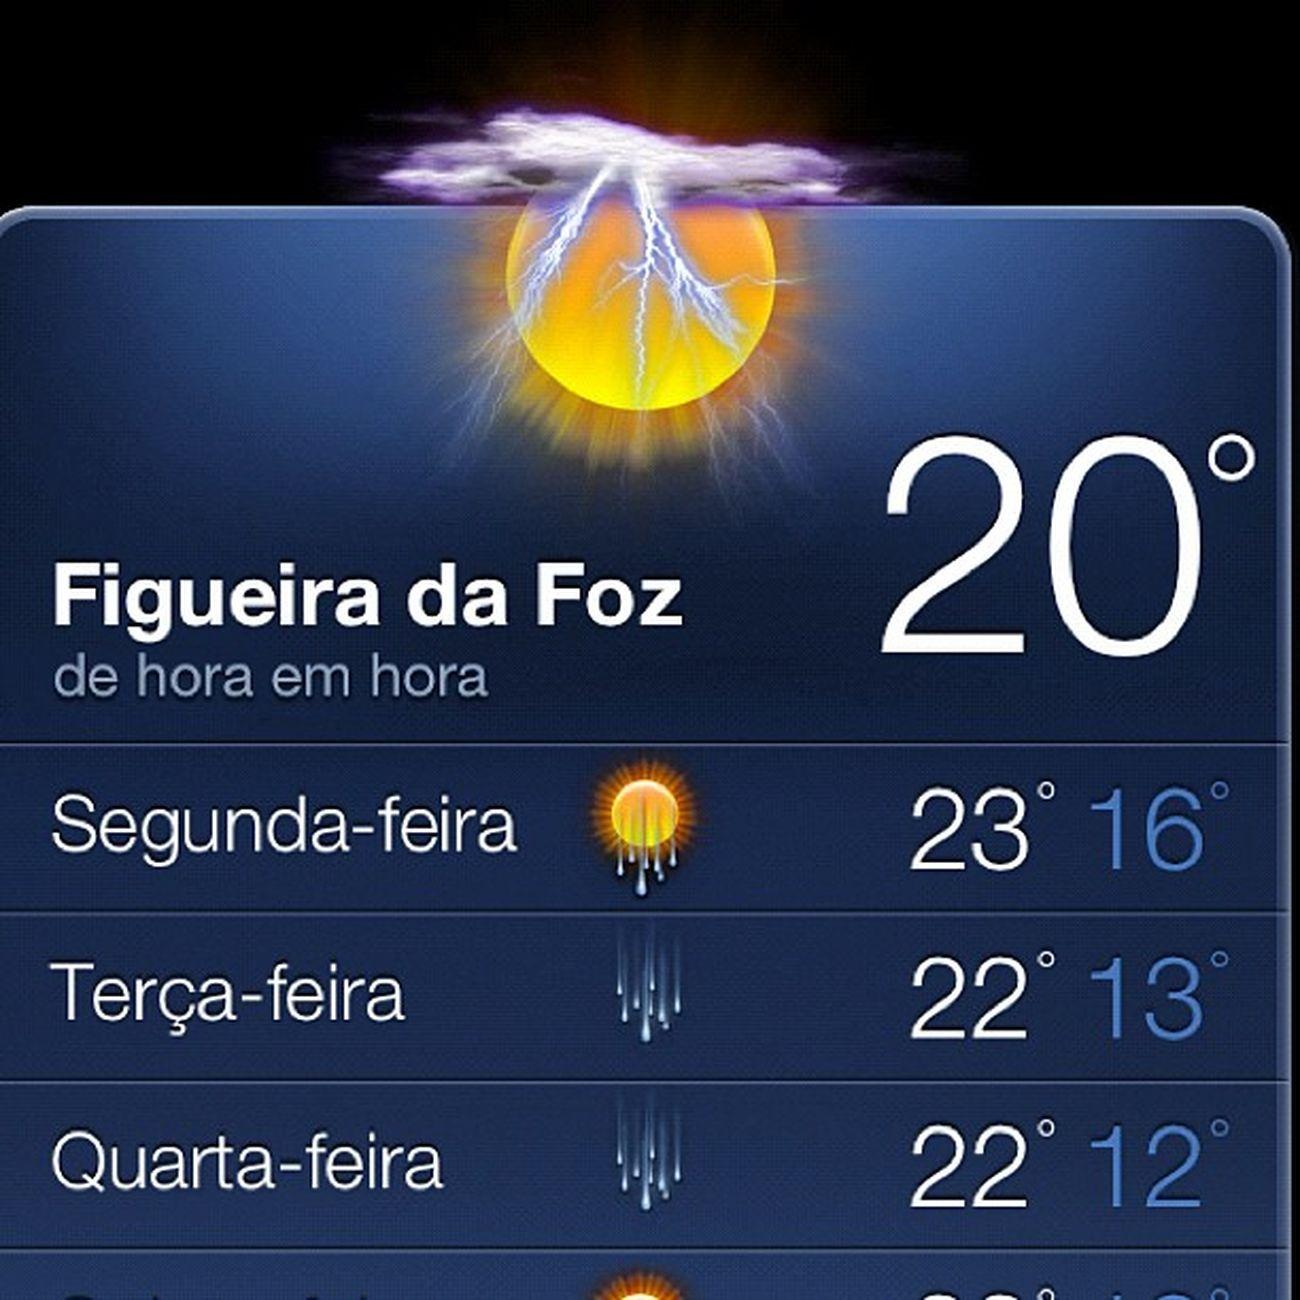 #figueira #figueiradafoz #iphone4s #instagram #autumn #rain #trovoada #clouds Clouds Rain Autumn IPhone4s Instagram Figueira Figueiradafoz Trovoada